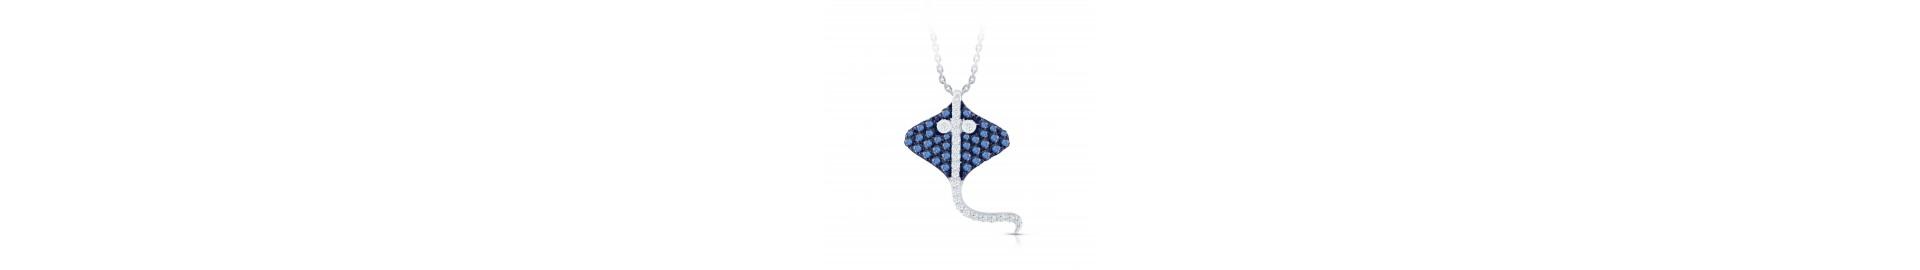 Cayman Sea Life Collection Jewelry | Rocky's Diamond Gallery Cayman